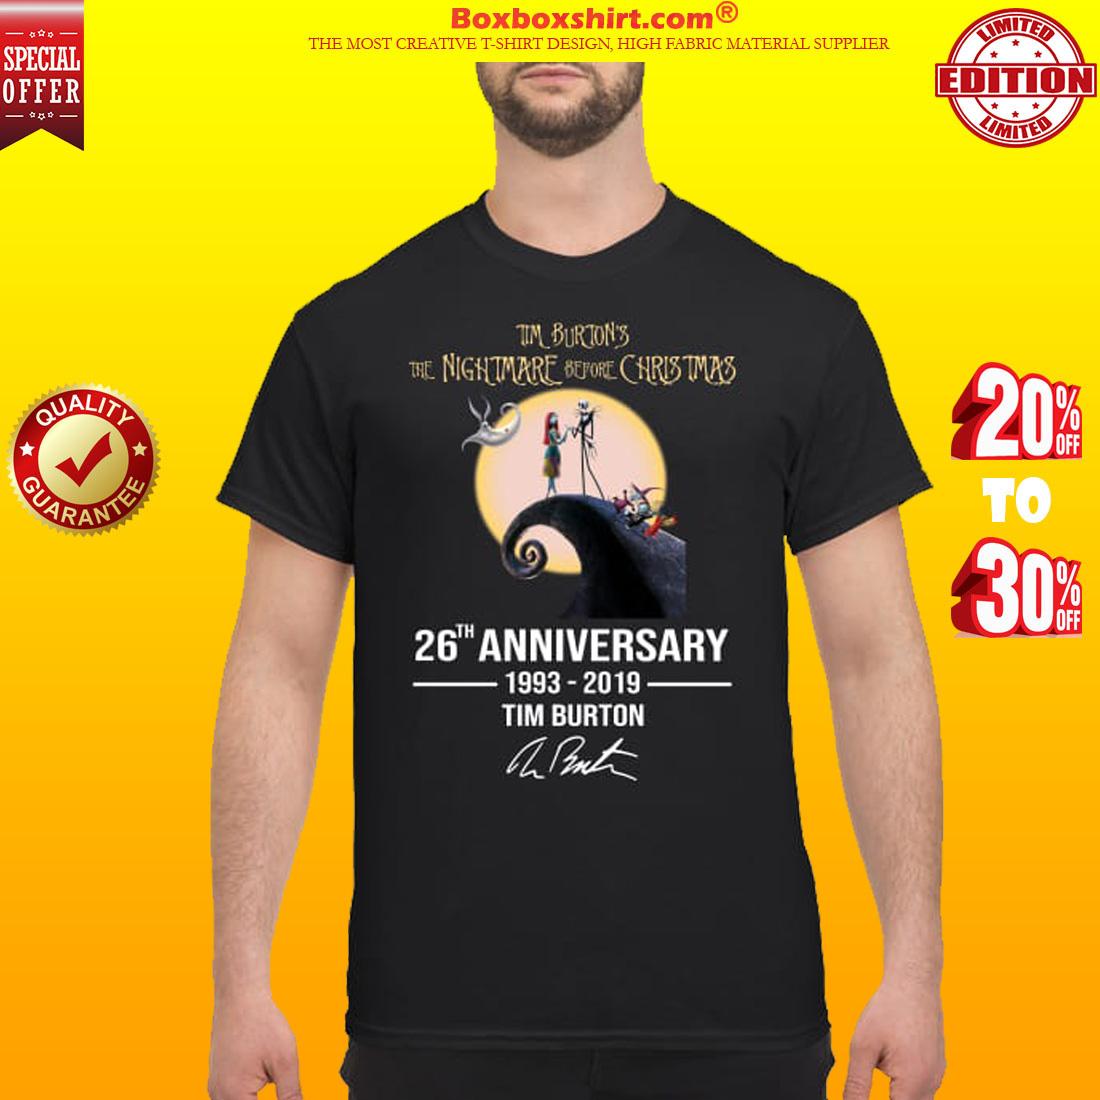 782e75e9 NEWEST] Tim Burtons nightmare before Christmas 26th anniversary shirt